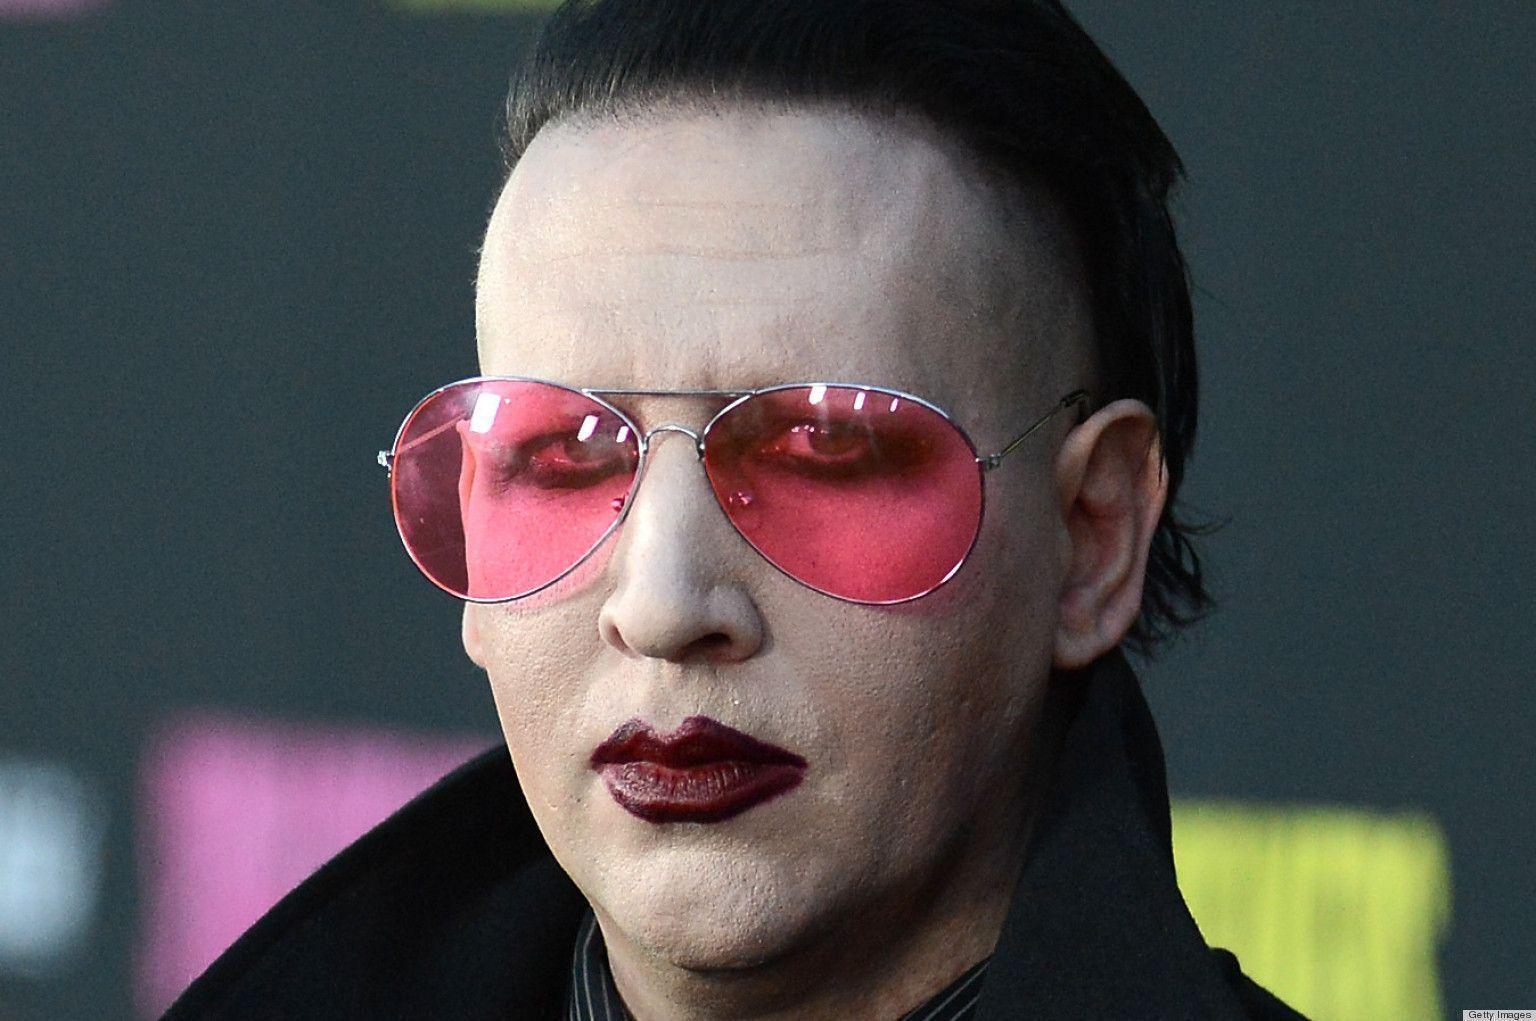 Mario Marilyn-Manson (SMB1 Hack)